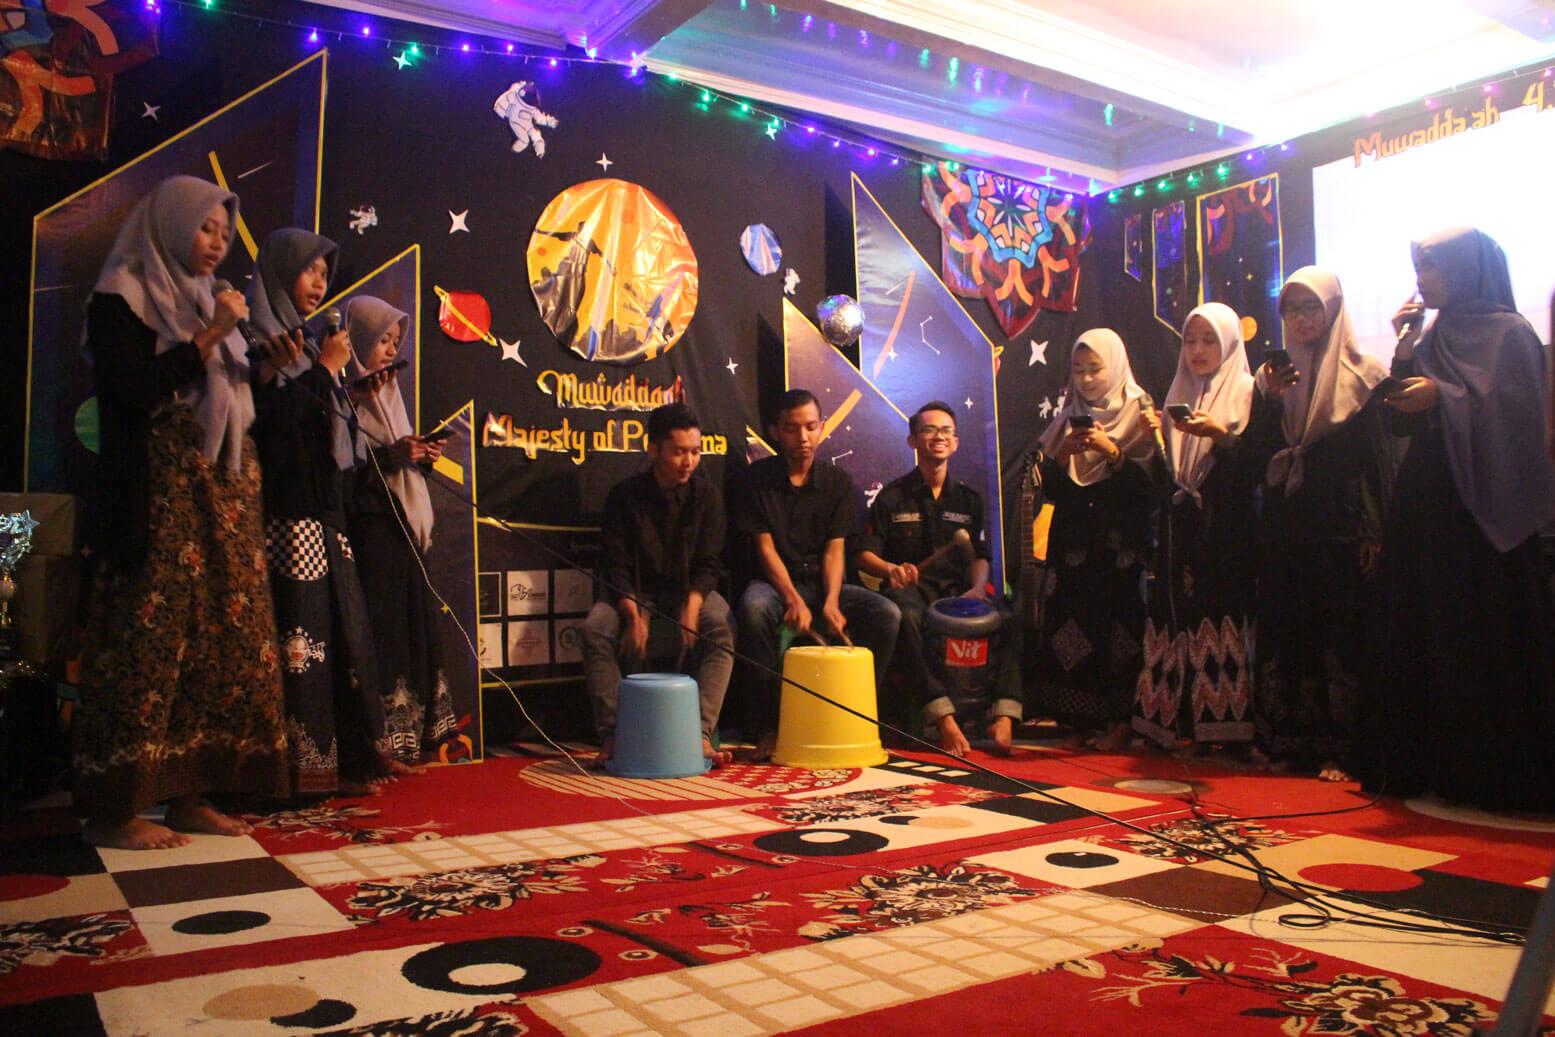 Foto salah satu penampilan di puncak acara Muwadda'ah